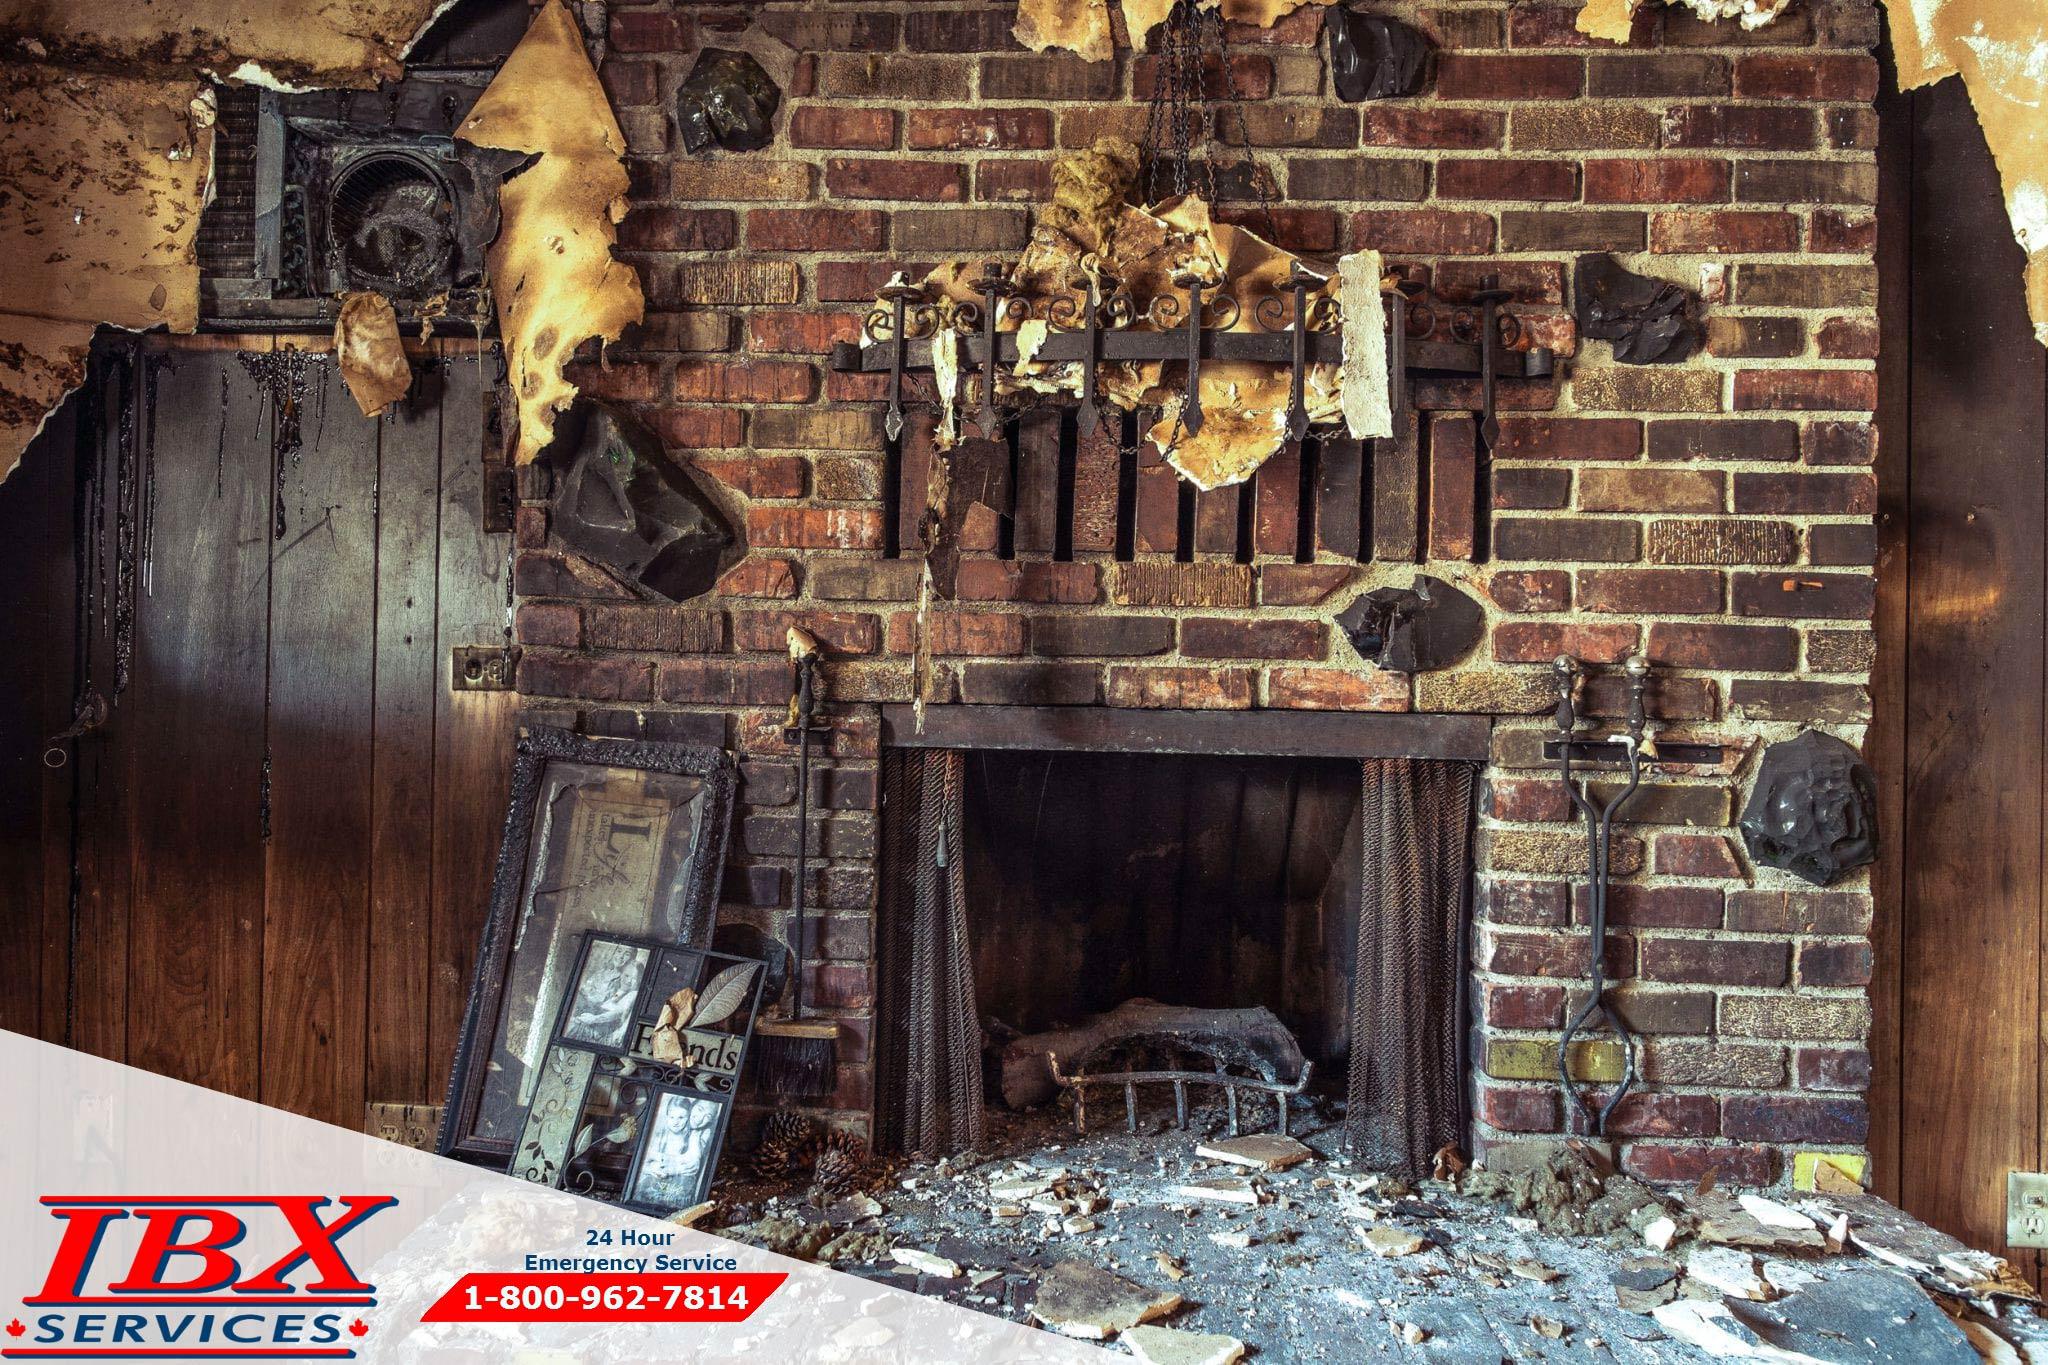 The Process of Fire Damage Restoration